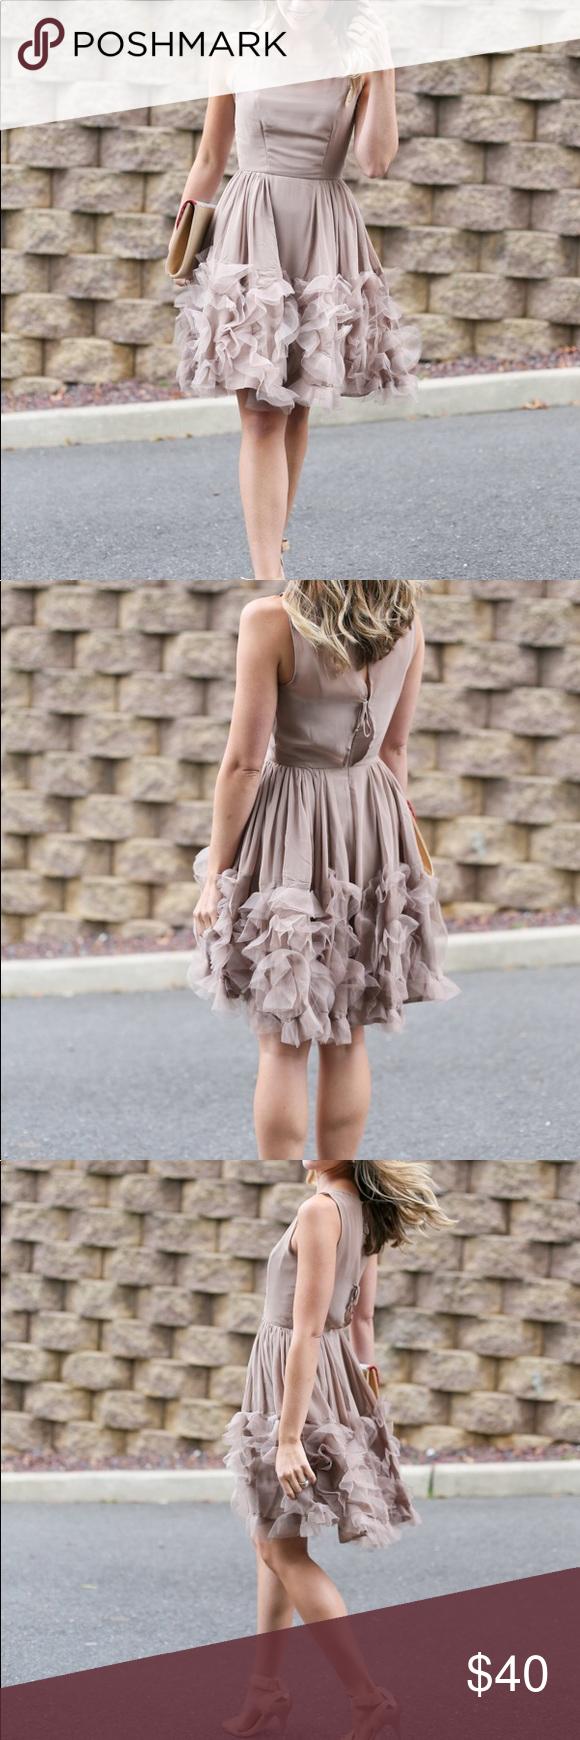 *CYBER WEEK* LC Lauren Conrad Ruffle Dress - Sz 8